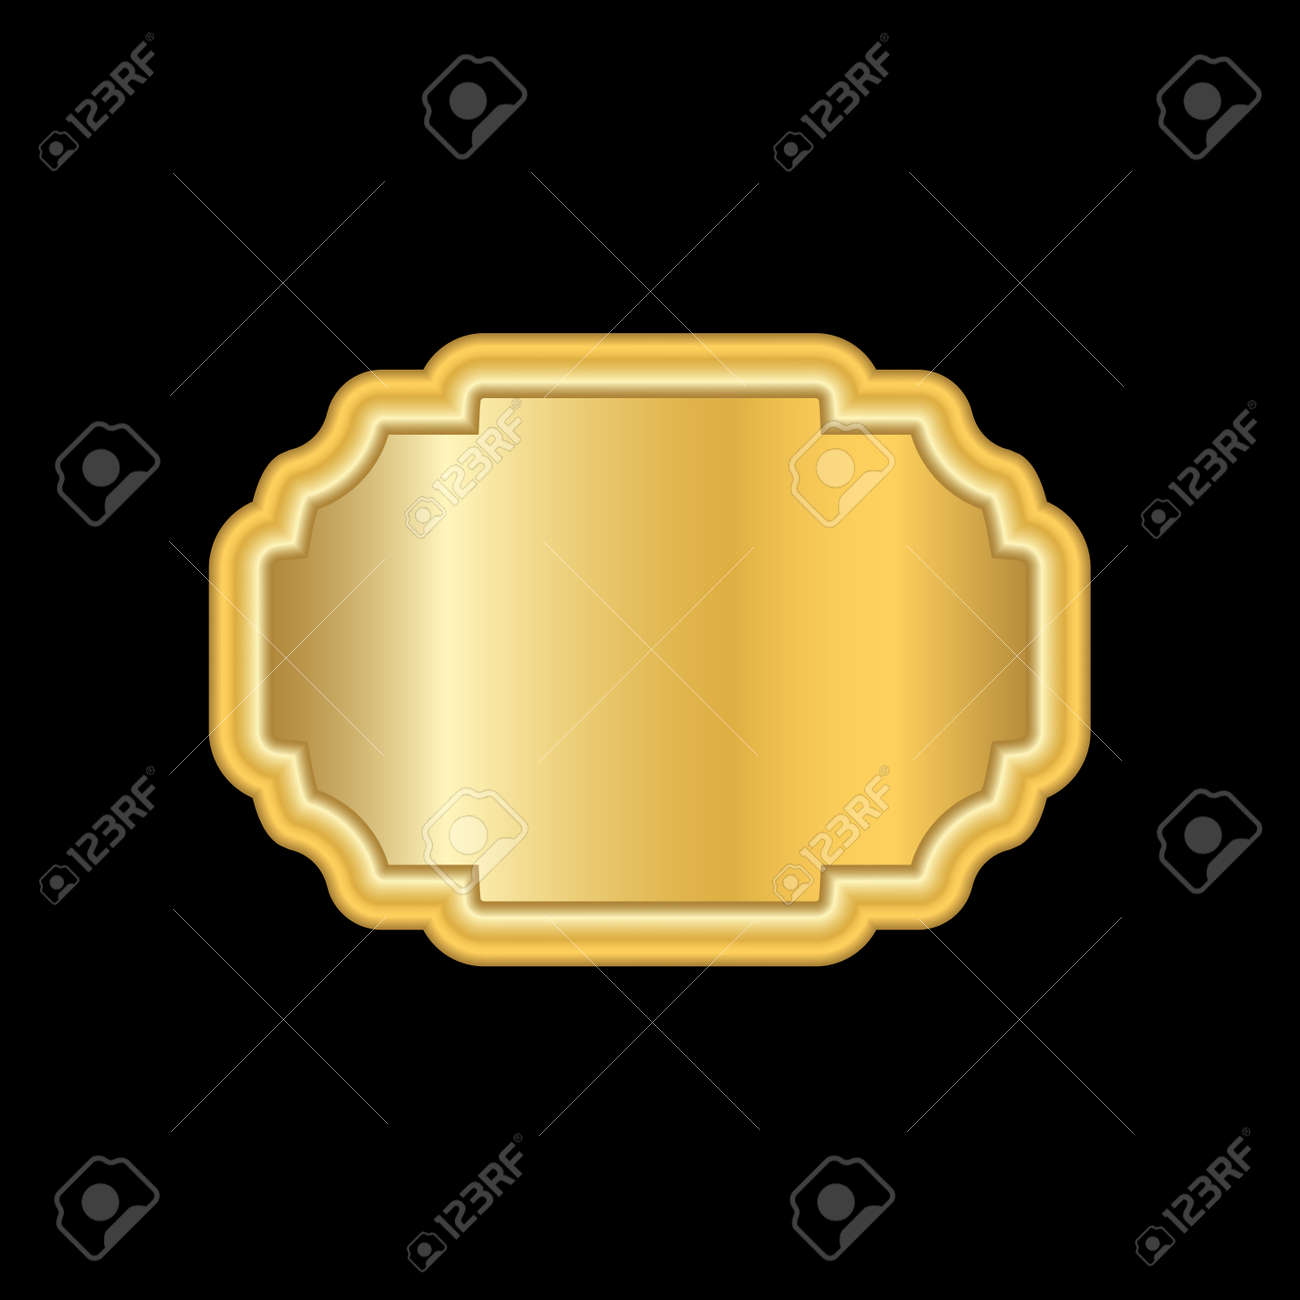 Gold Frame. Beautiful Simple Golden Design. Vintage Style Decorative ...